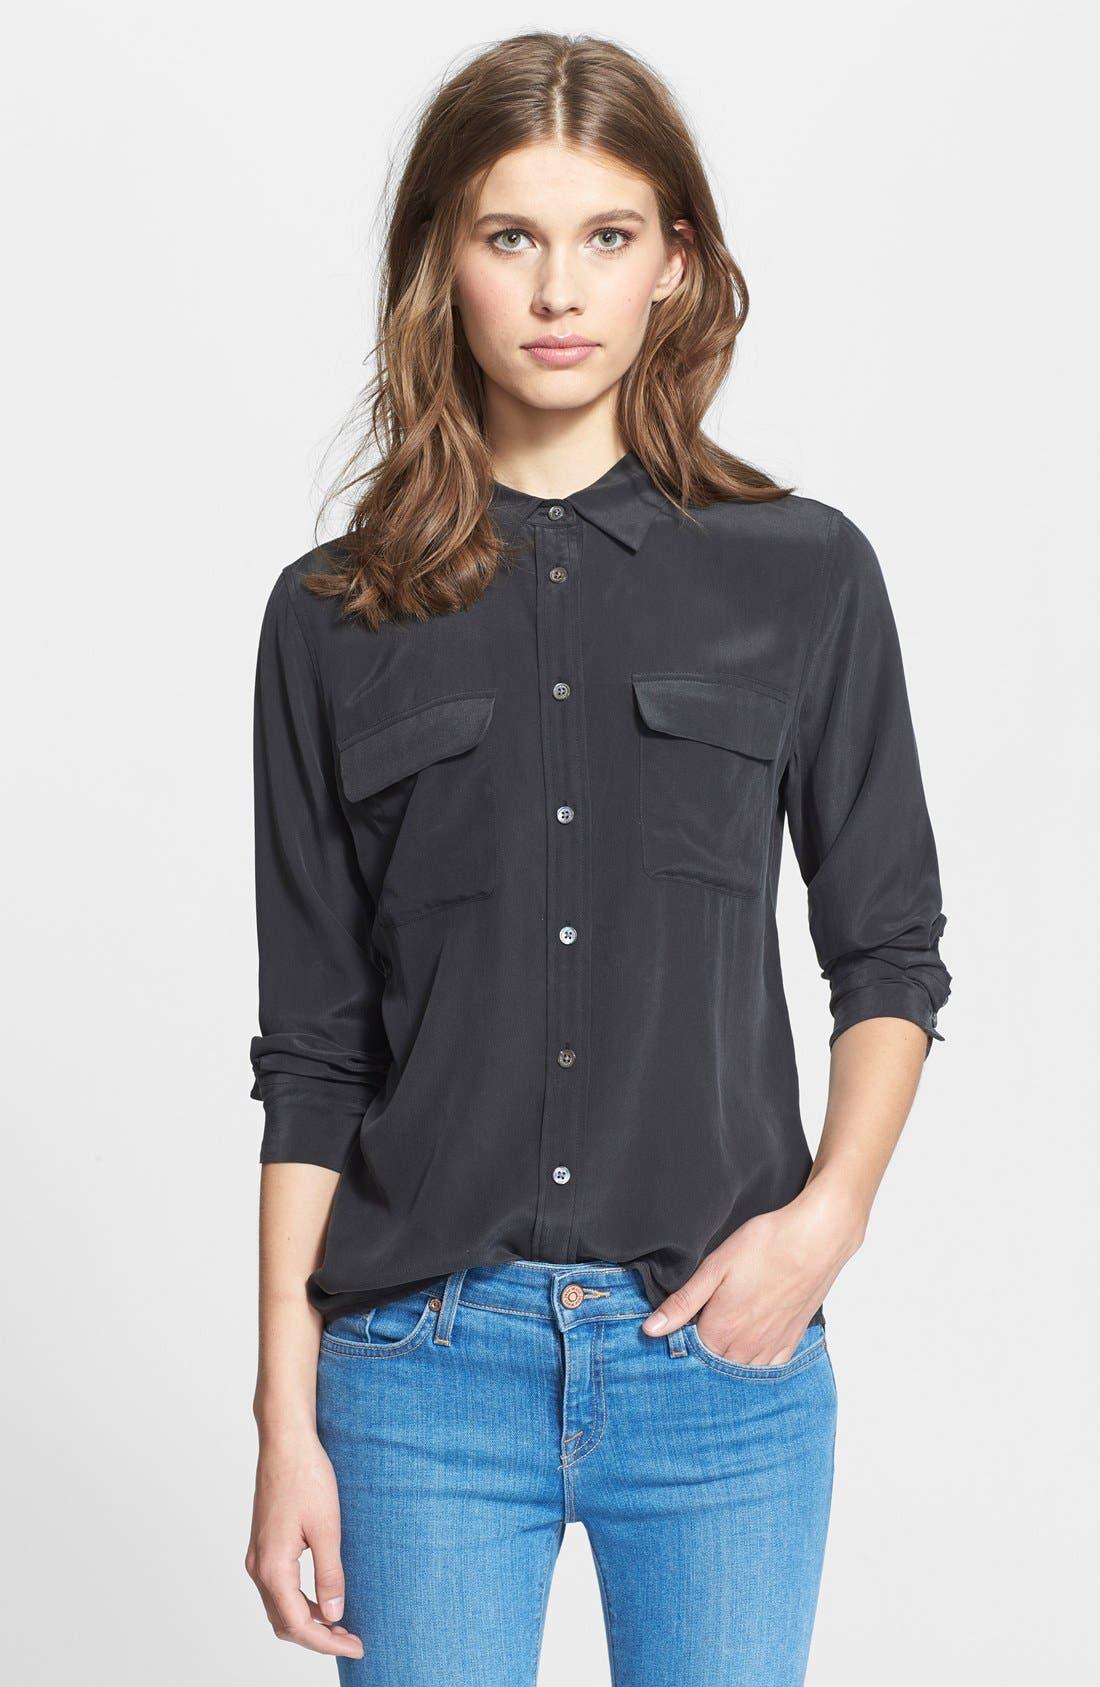 Alternate Image 1 Selected - Equipment 'Slim Signature' Silk Shirt